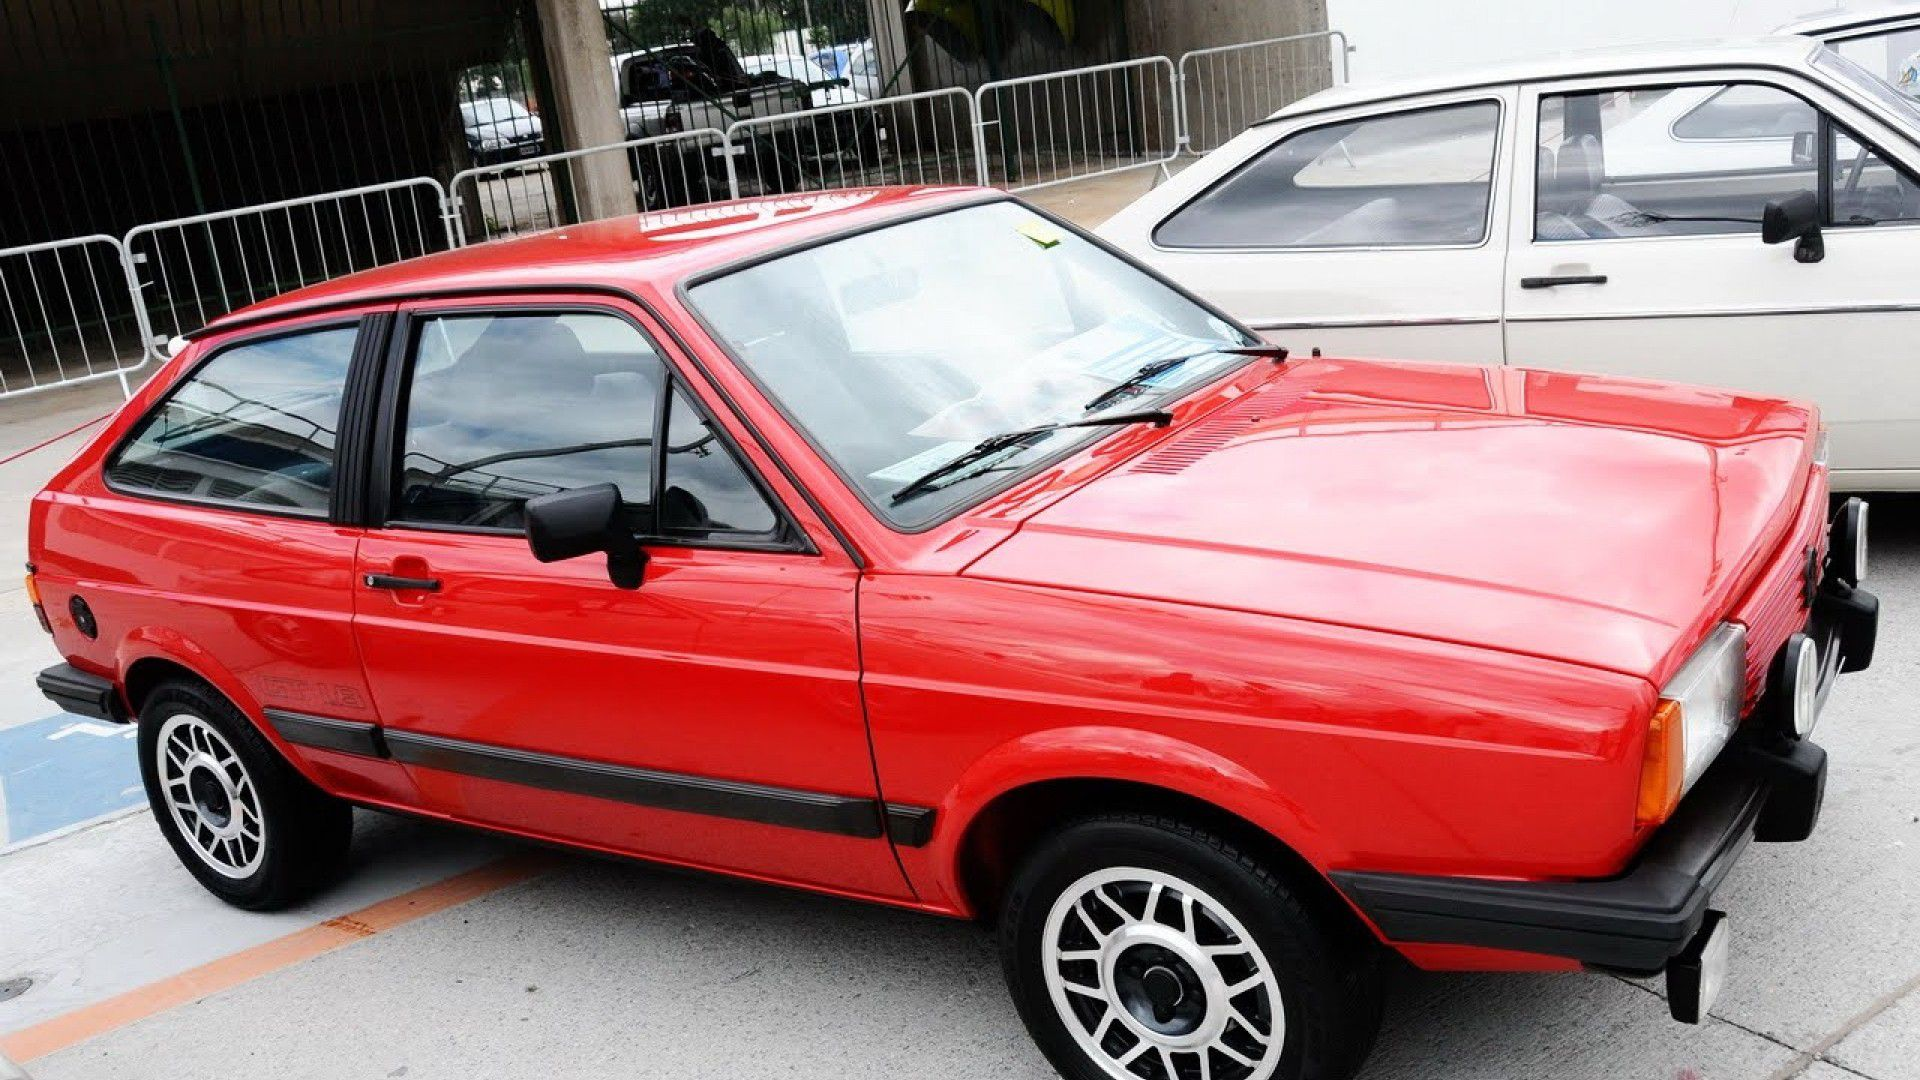 Volkswagen Gol G1 187 Definitive List Cars